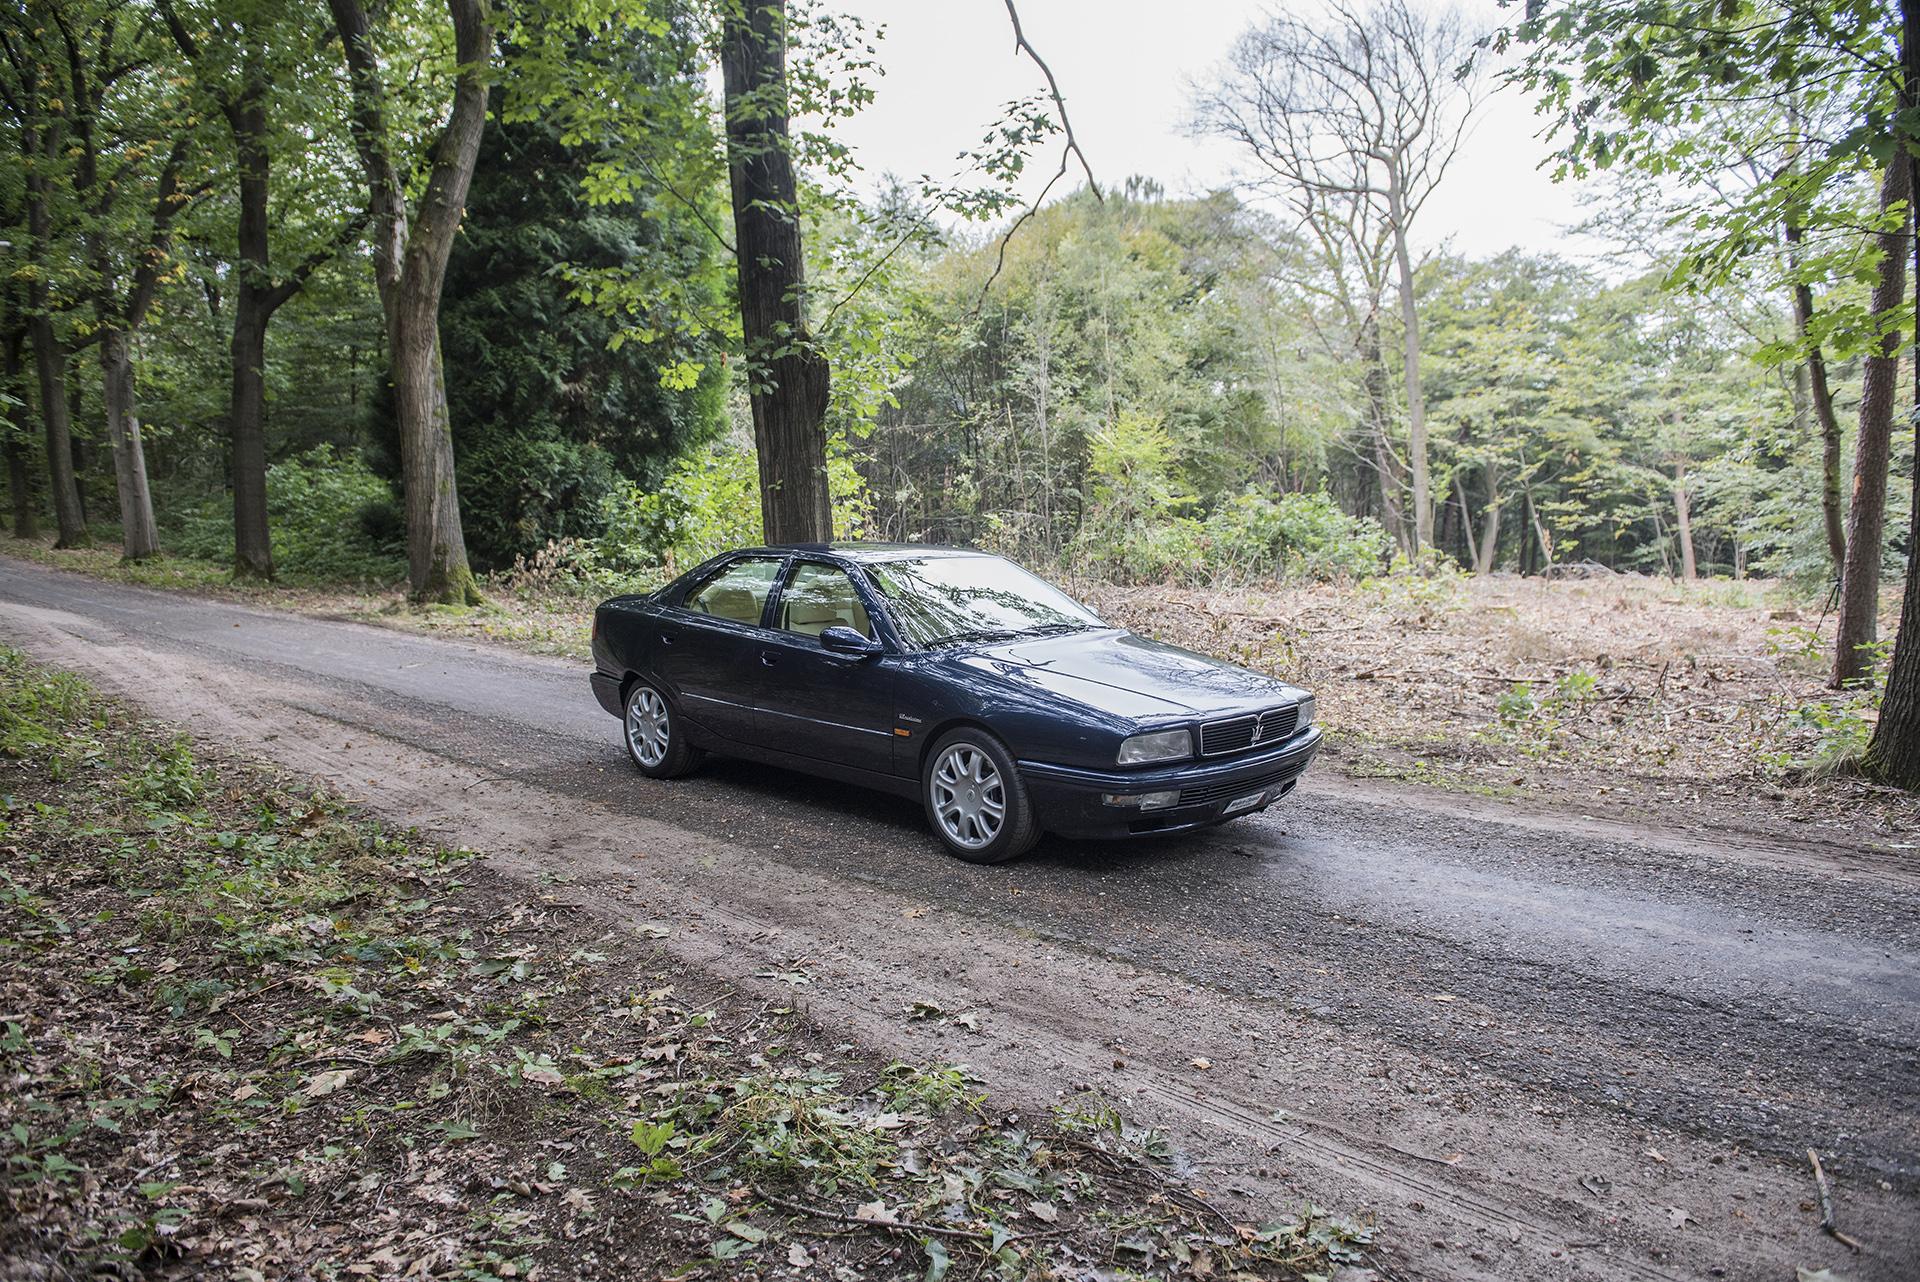 Maserati Quattroporte Evoluzione V8 - Modern Classics ...